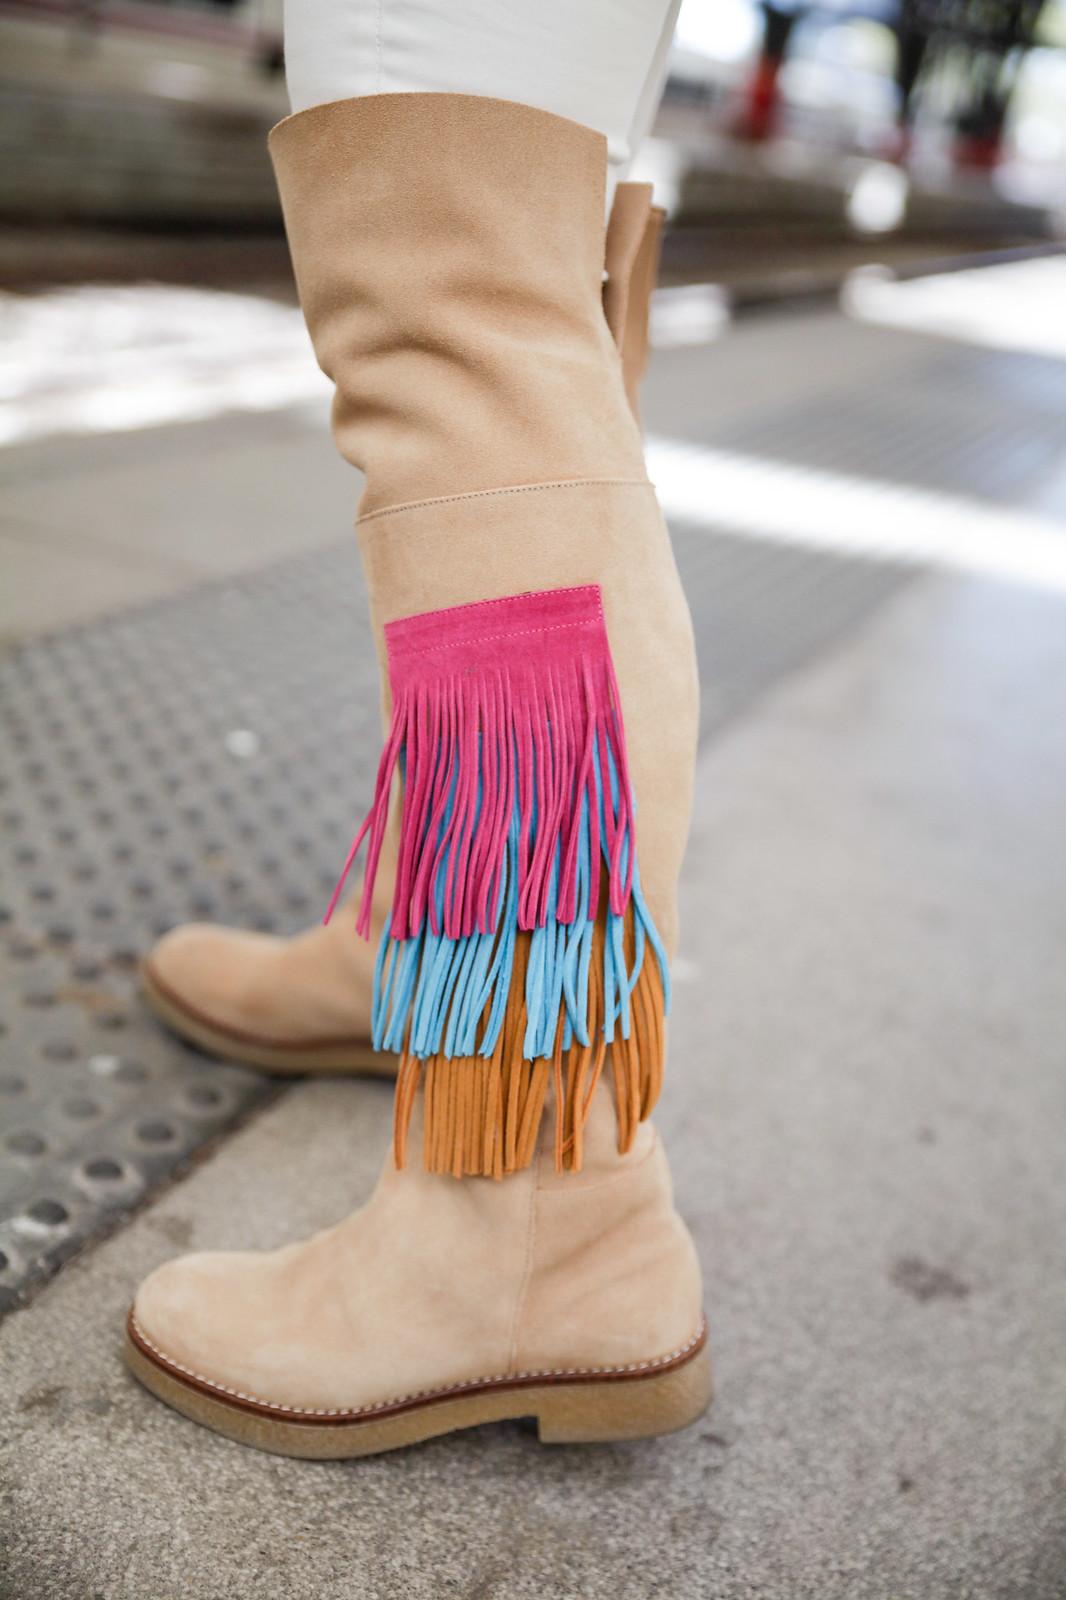 05_como_combinar_la_ropa_verde_turquesa_ideas_look_street_style_theguestgirl_ruga_boots_fringes_barcelona_influencer_top_blogger